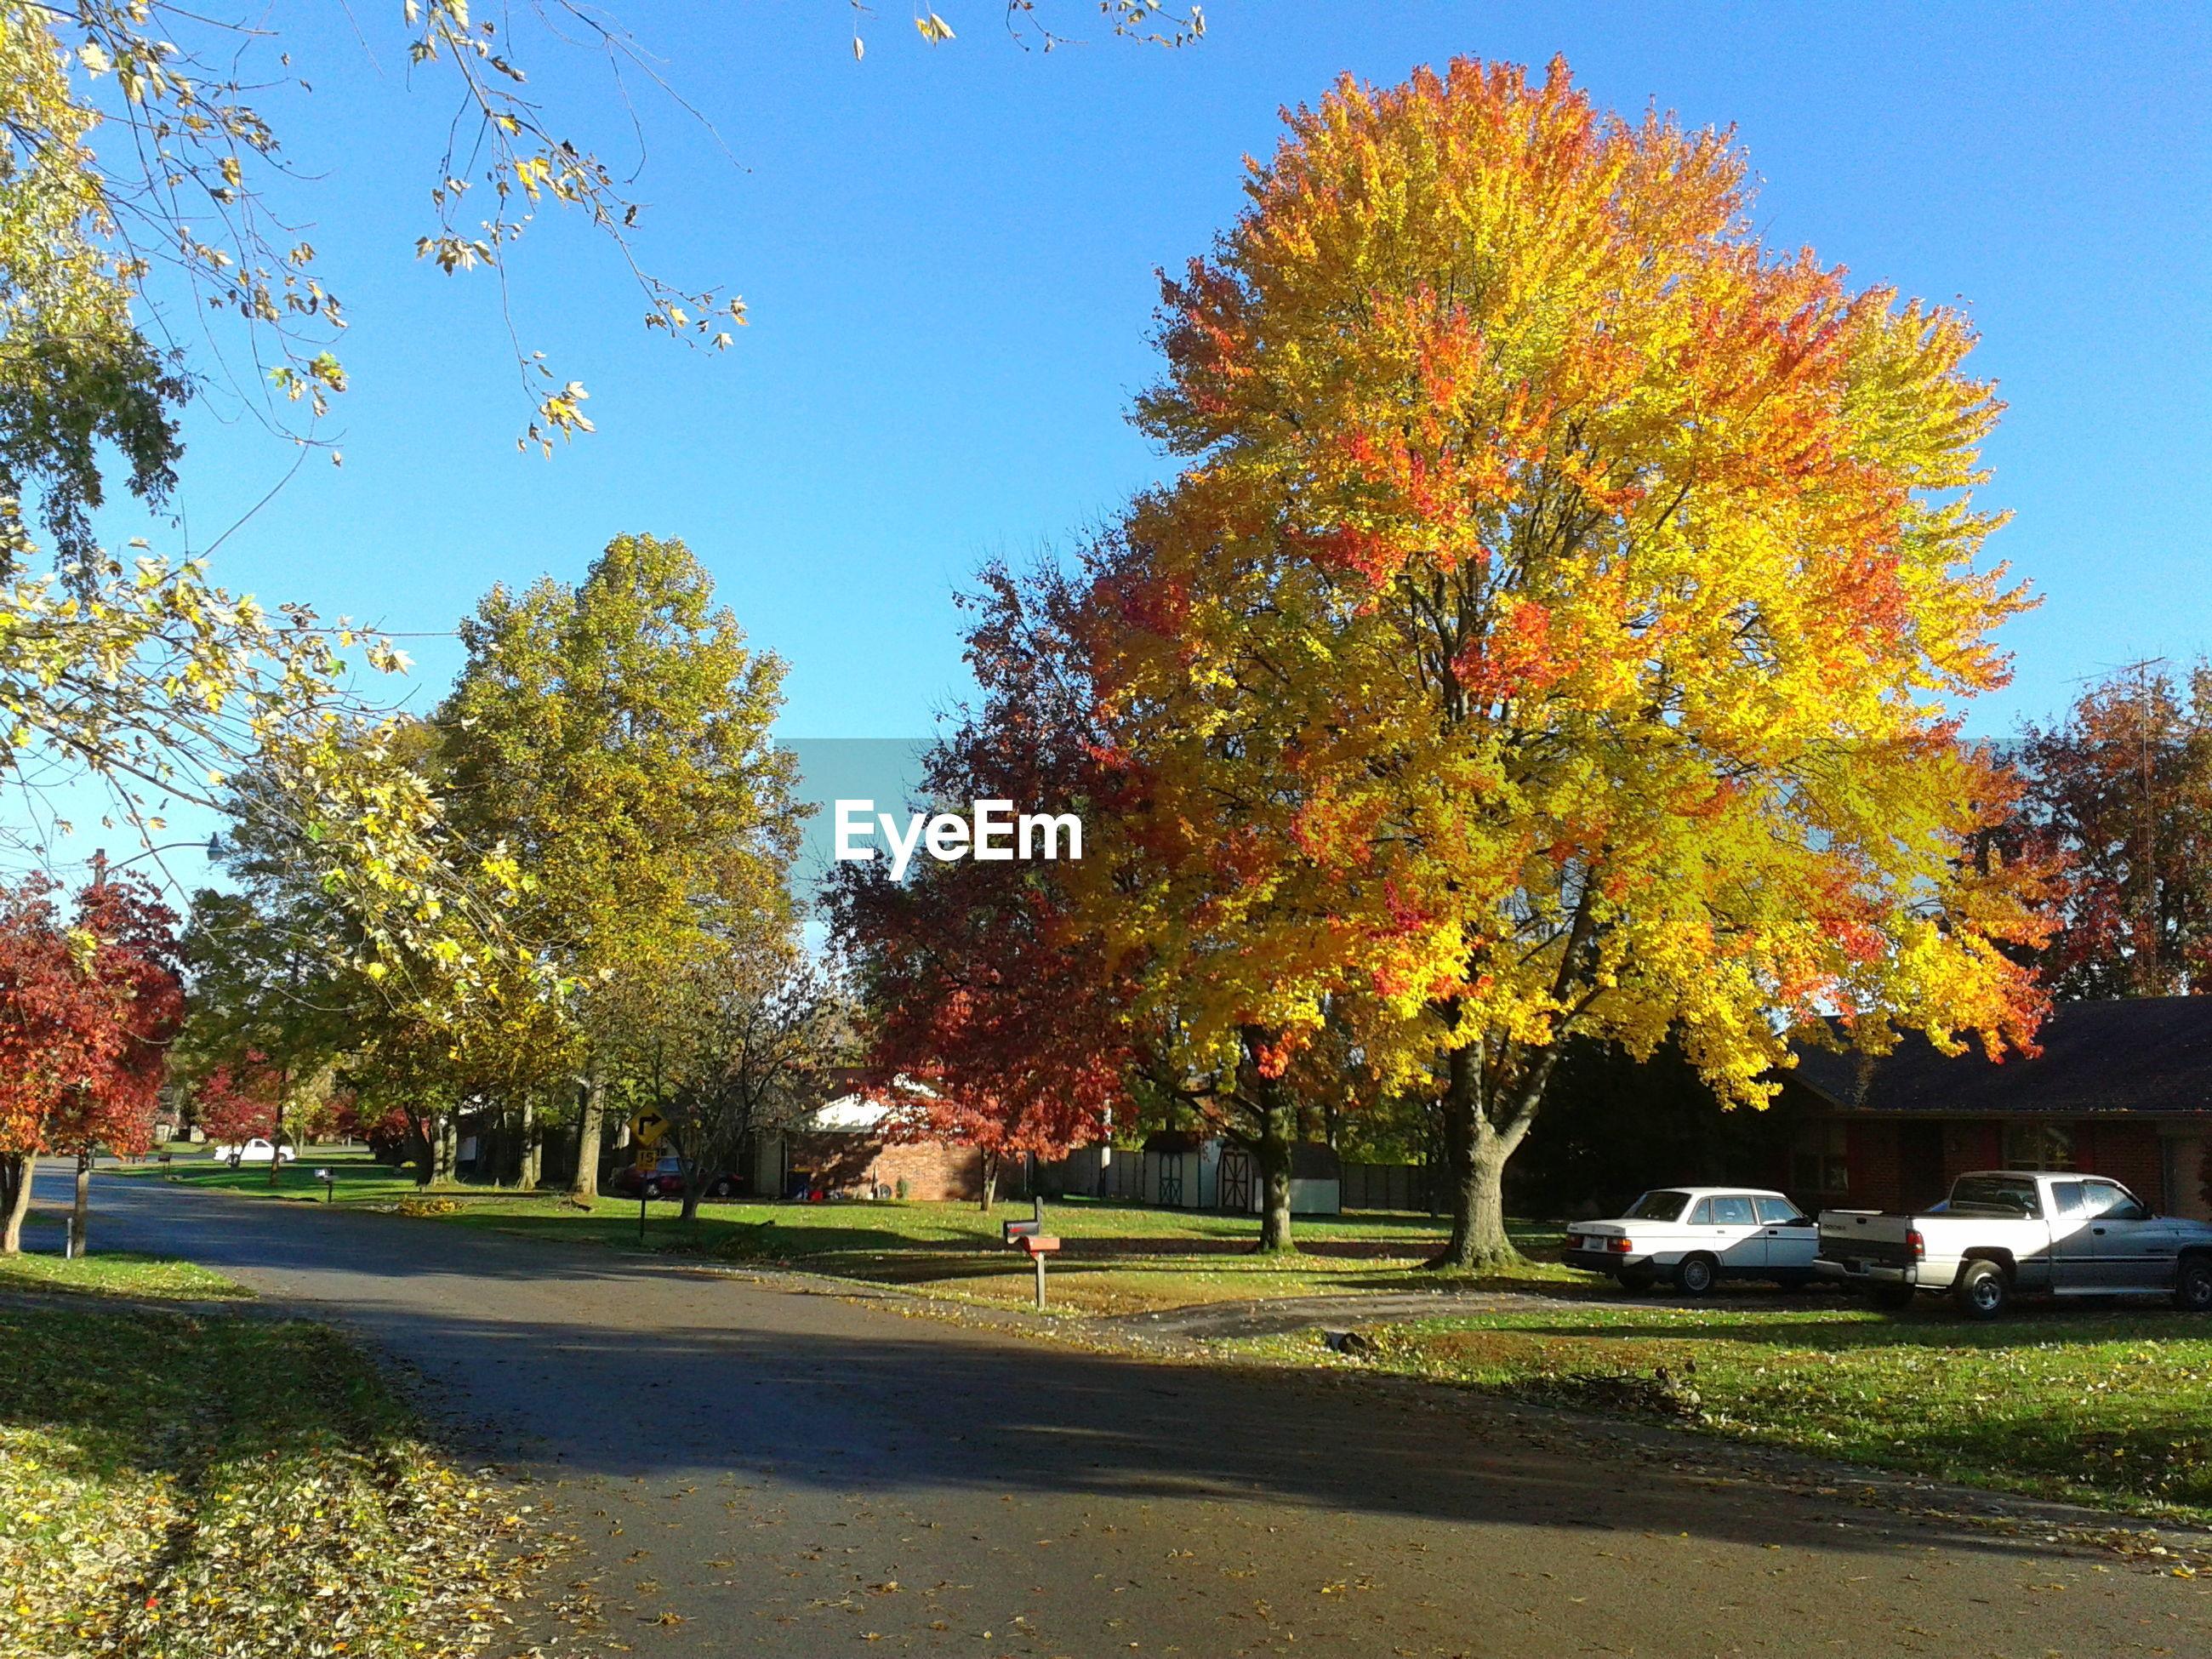 Trees at roadside against sky